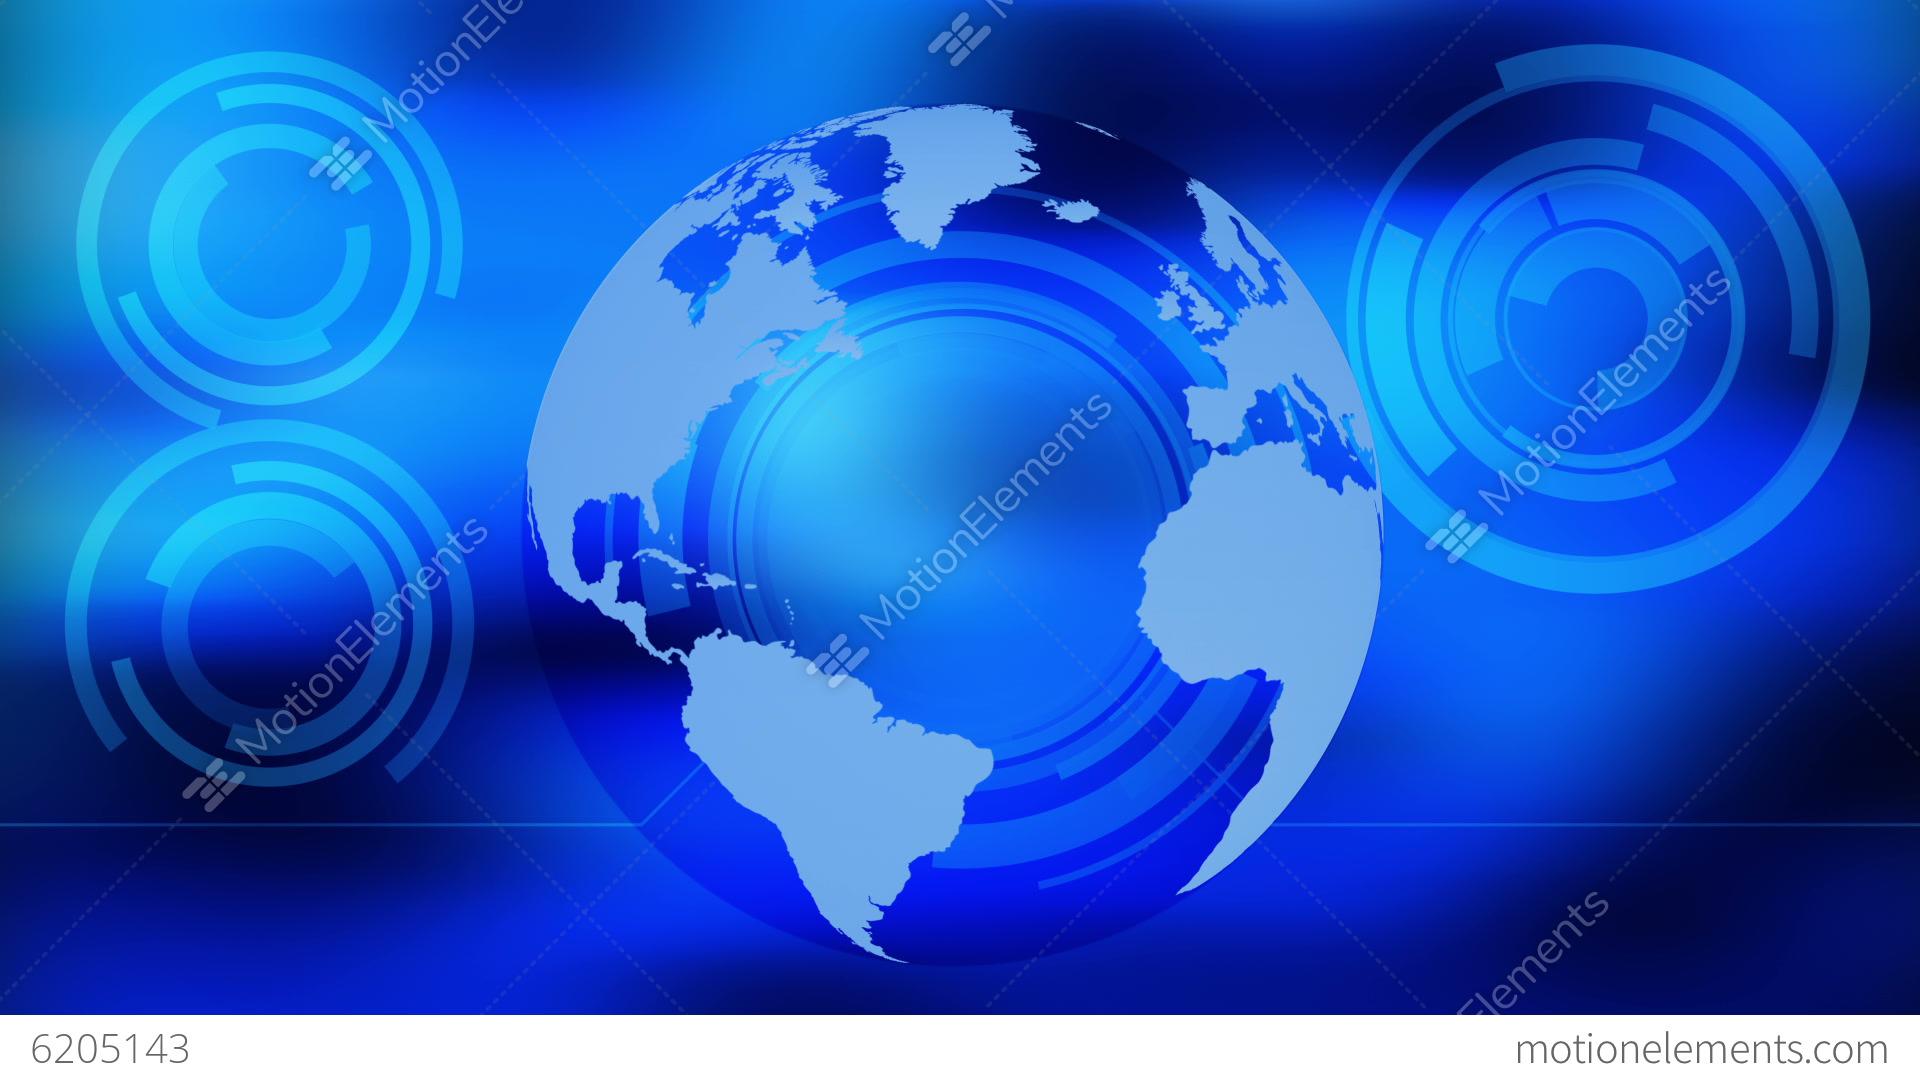 world globe technology blue background stock animation Drawing Earth Clip Art World Globe Vector Clip Art